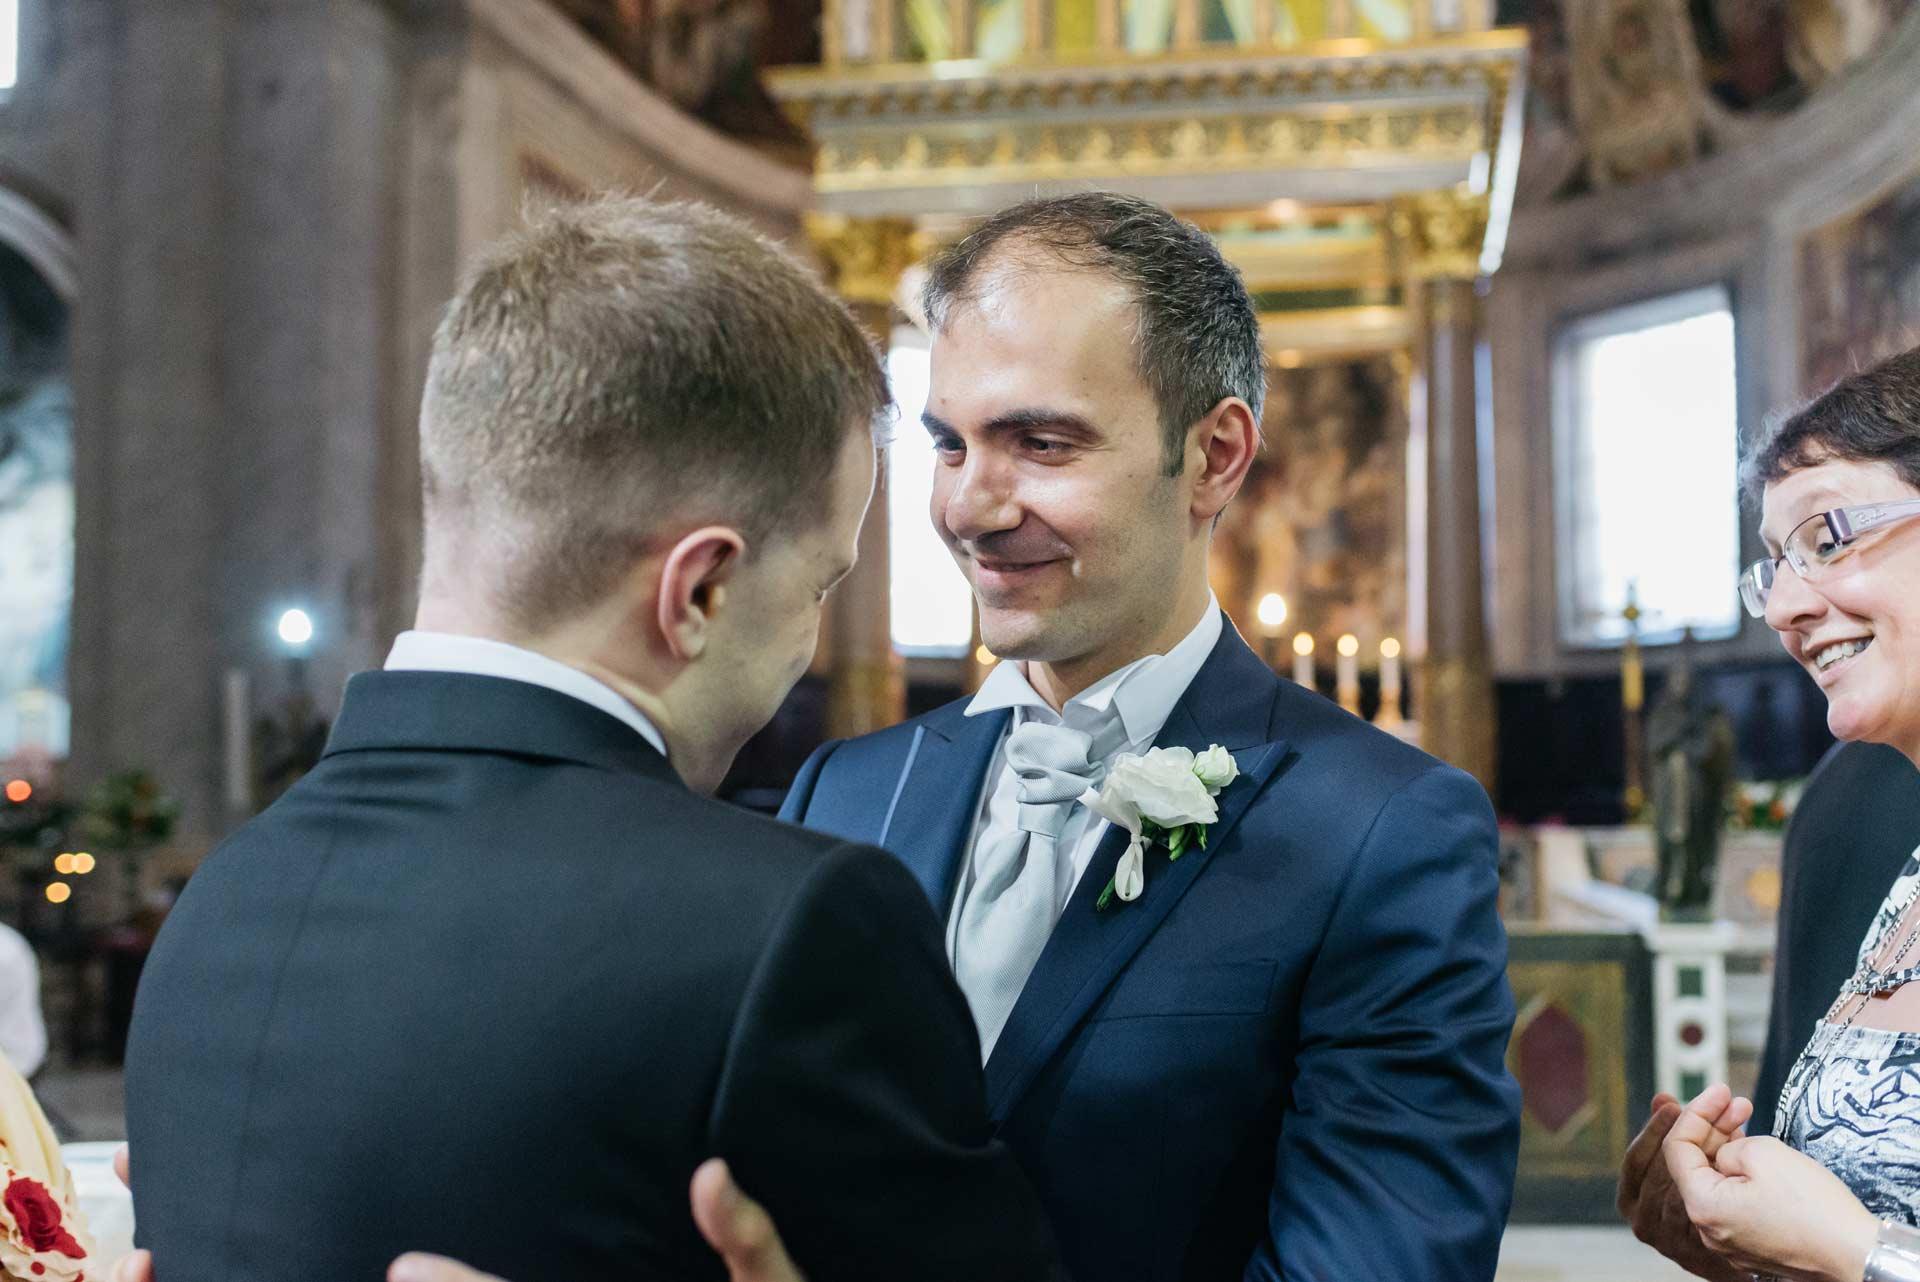 fotografo-matrimonio-reportage-roma-6-C&M-simone-nunzi